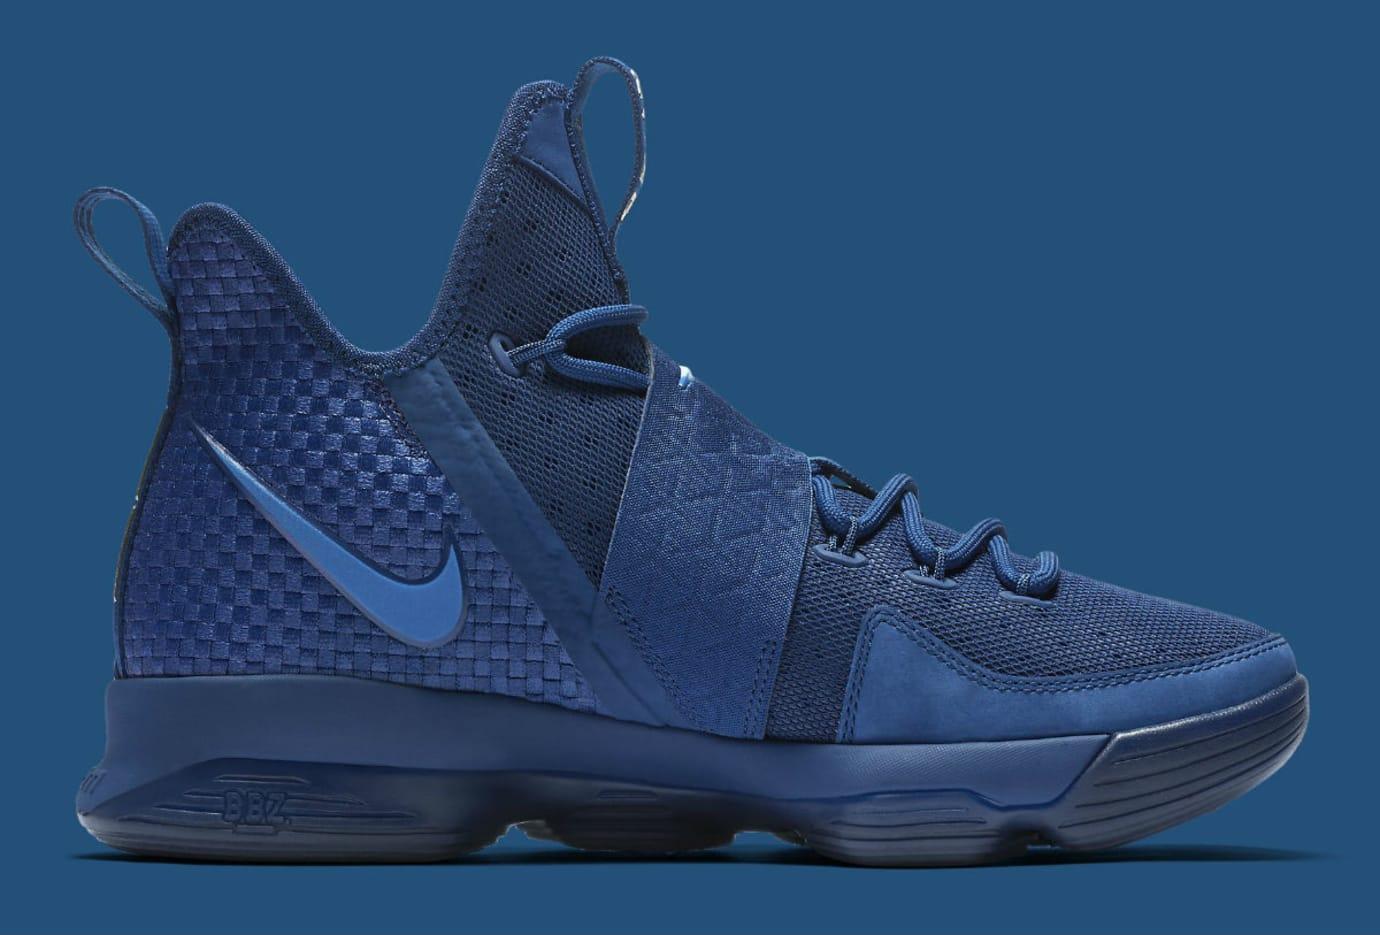 7aba217f3bb Nike LeBron 14 Agimat U.S. Release Date Medial 852402-400